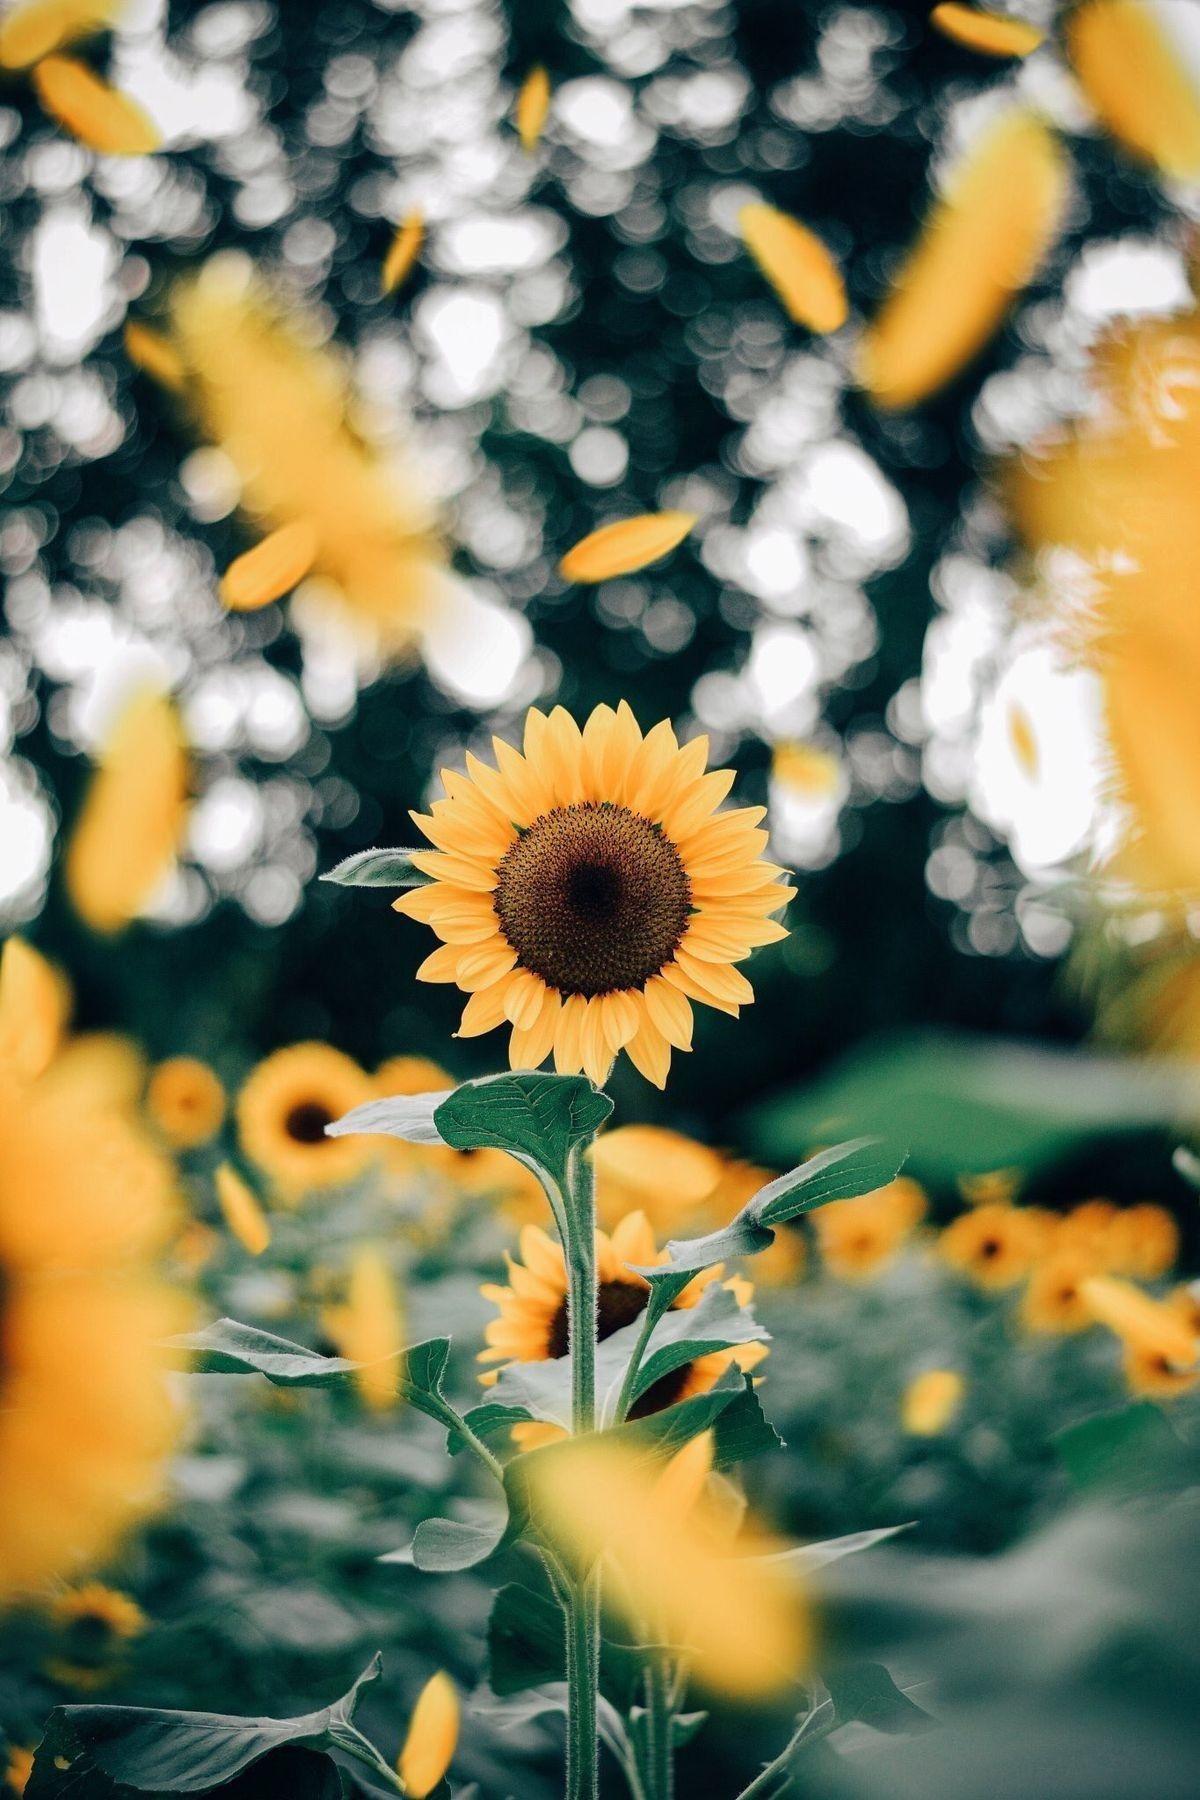 Pin De Aisyah Em Beautiful Yellow Flowers Flores Fotografia Estetica Amarela Fotografia Da Natureza